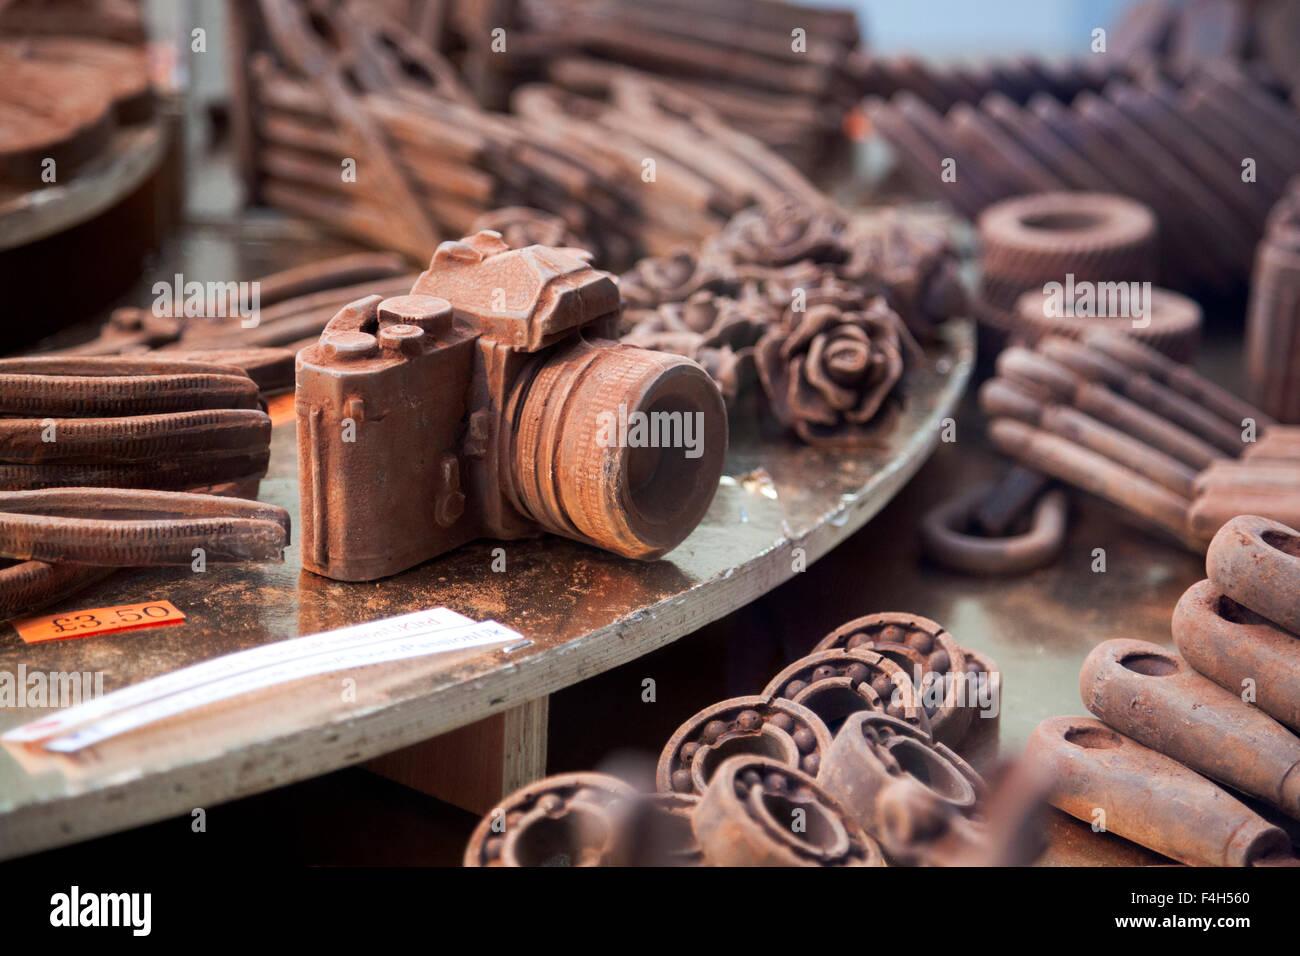 London, UK. 18th October 2015 - Analog camera made of chocolate ...